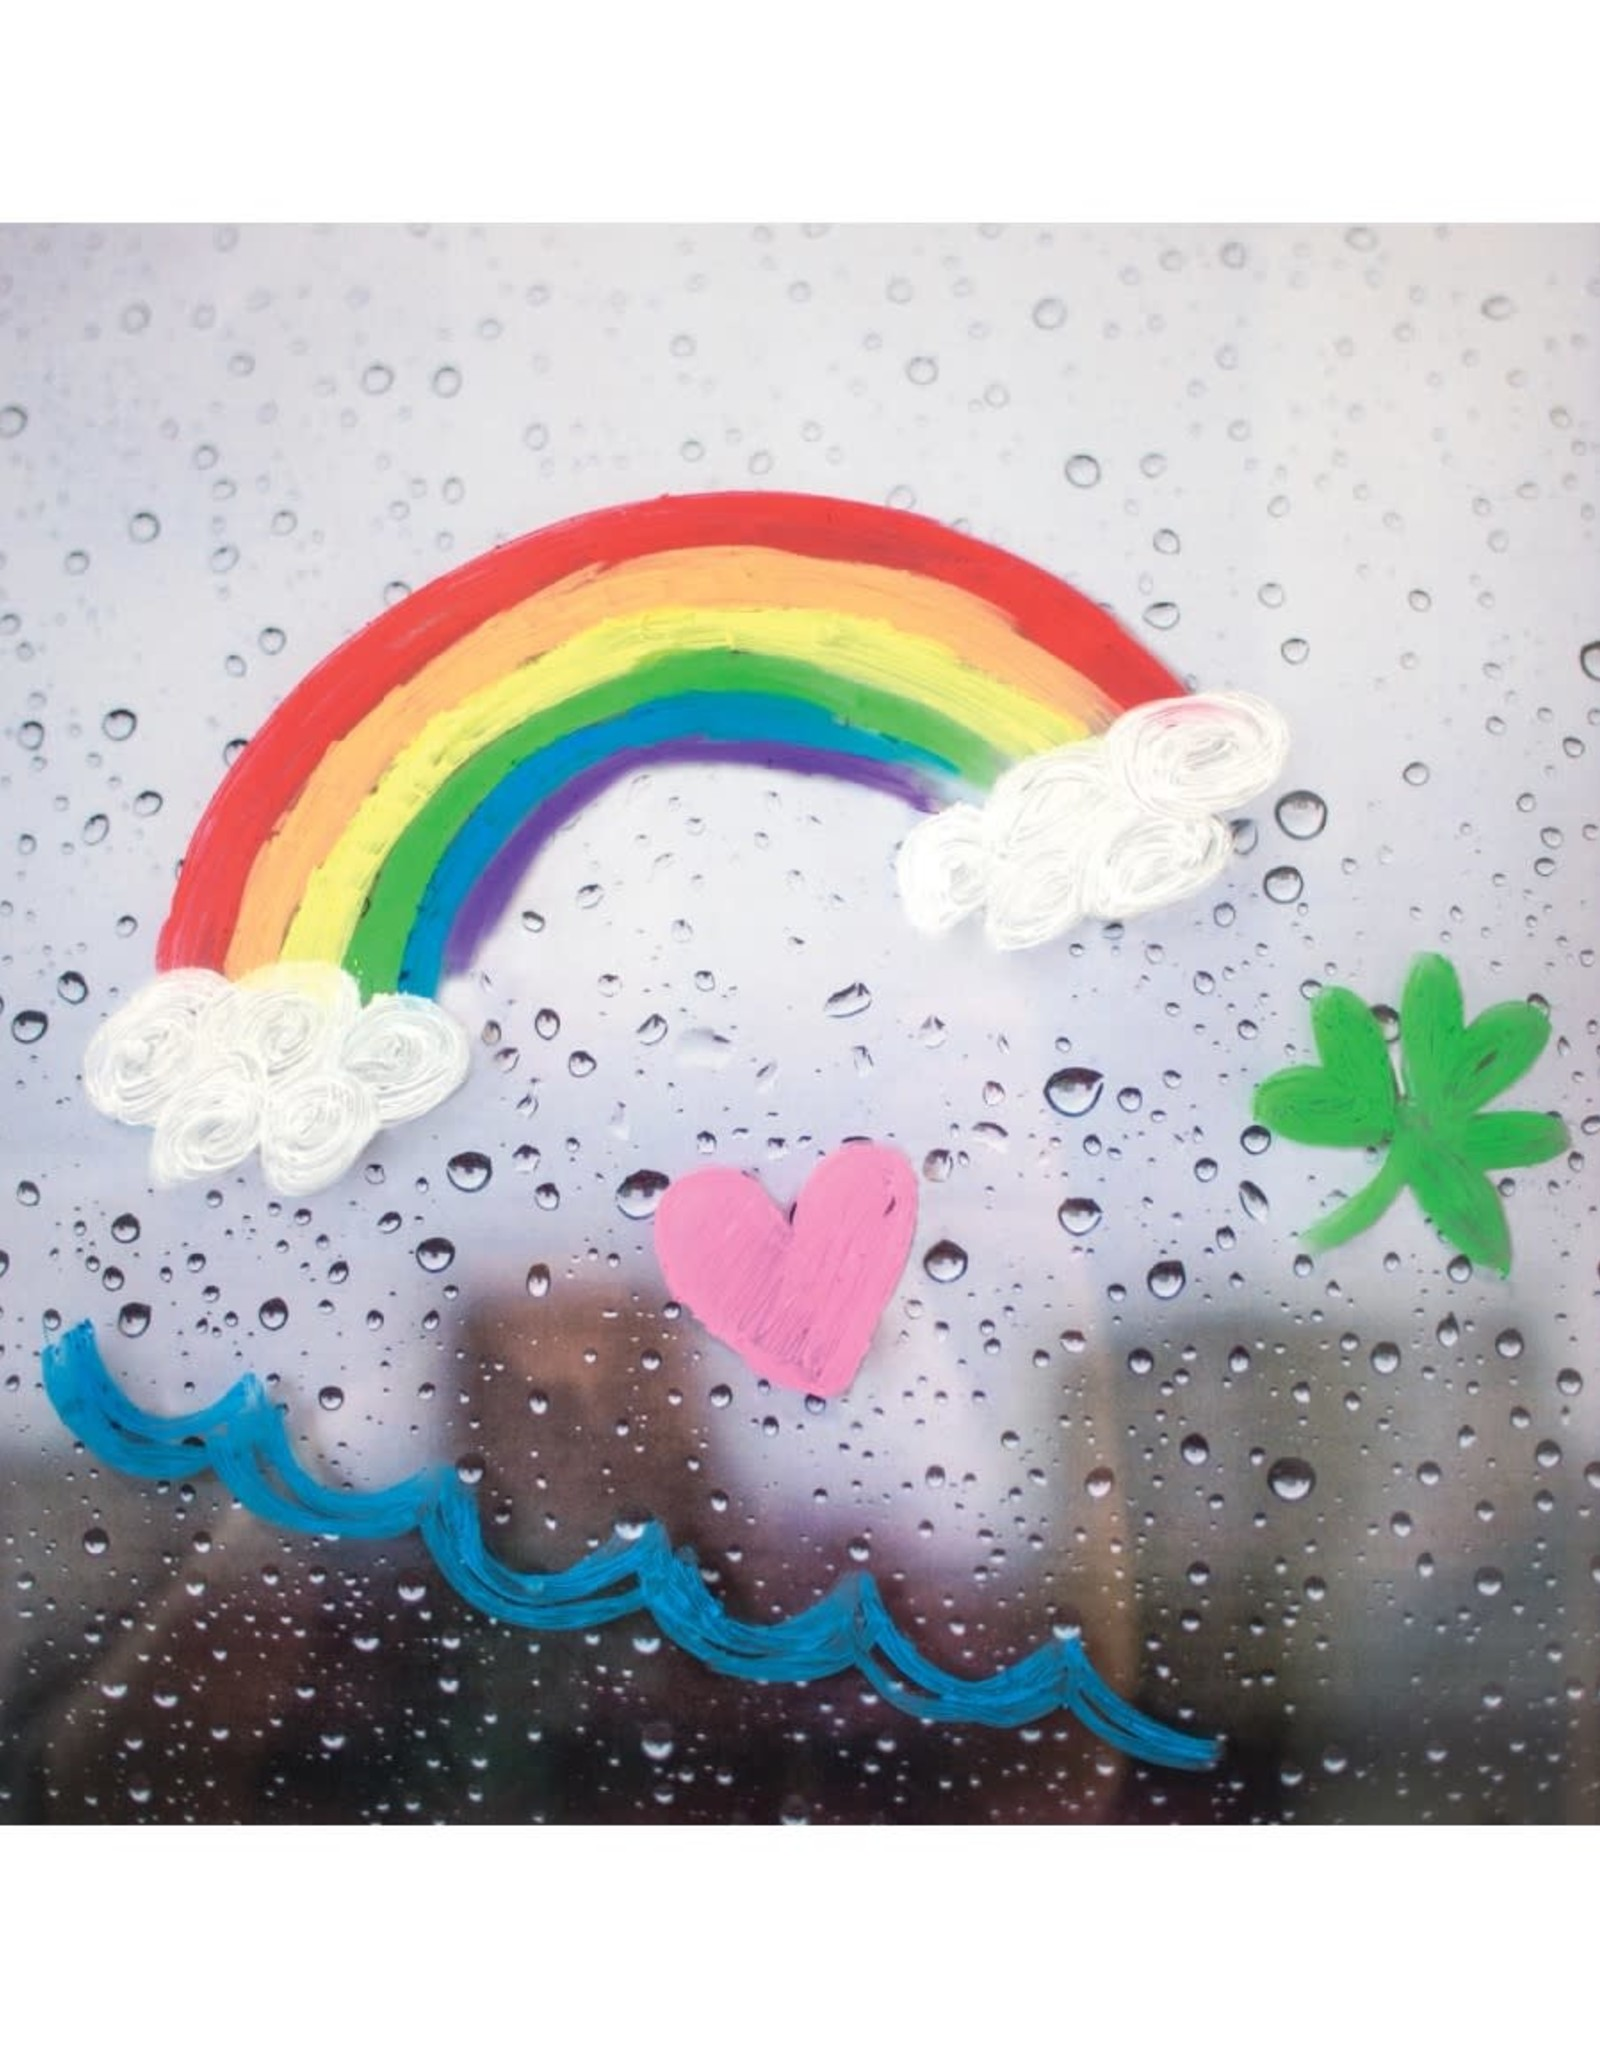 Ooly Rainy Dayz Crayons - Set of 12